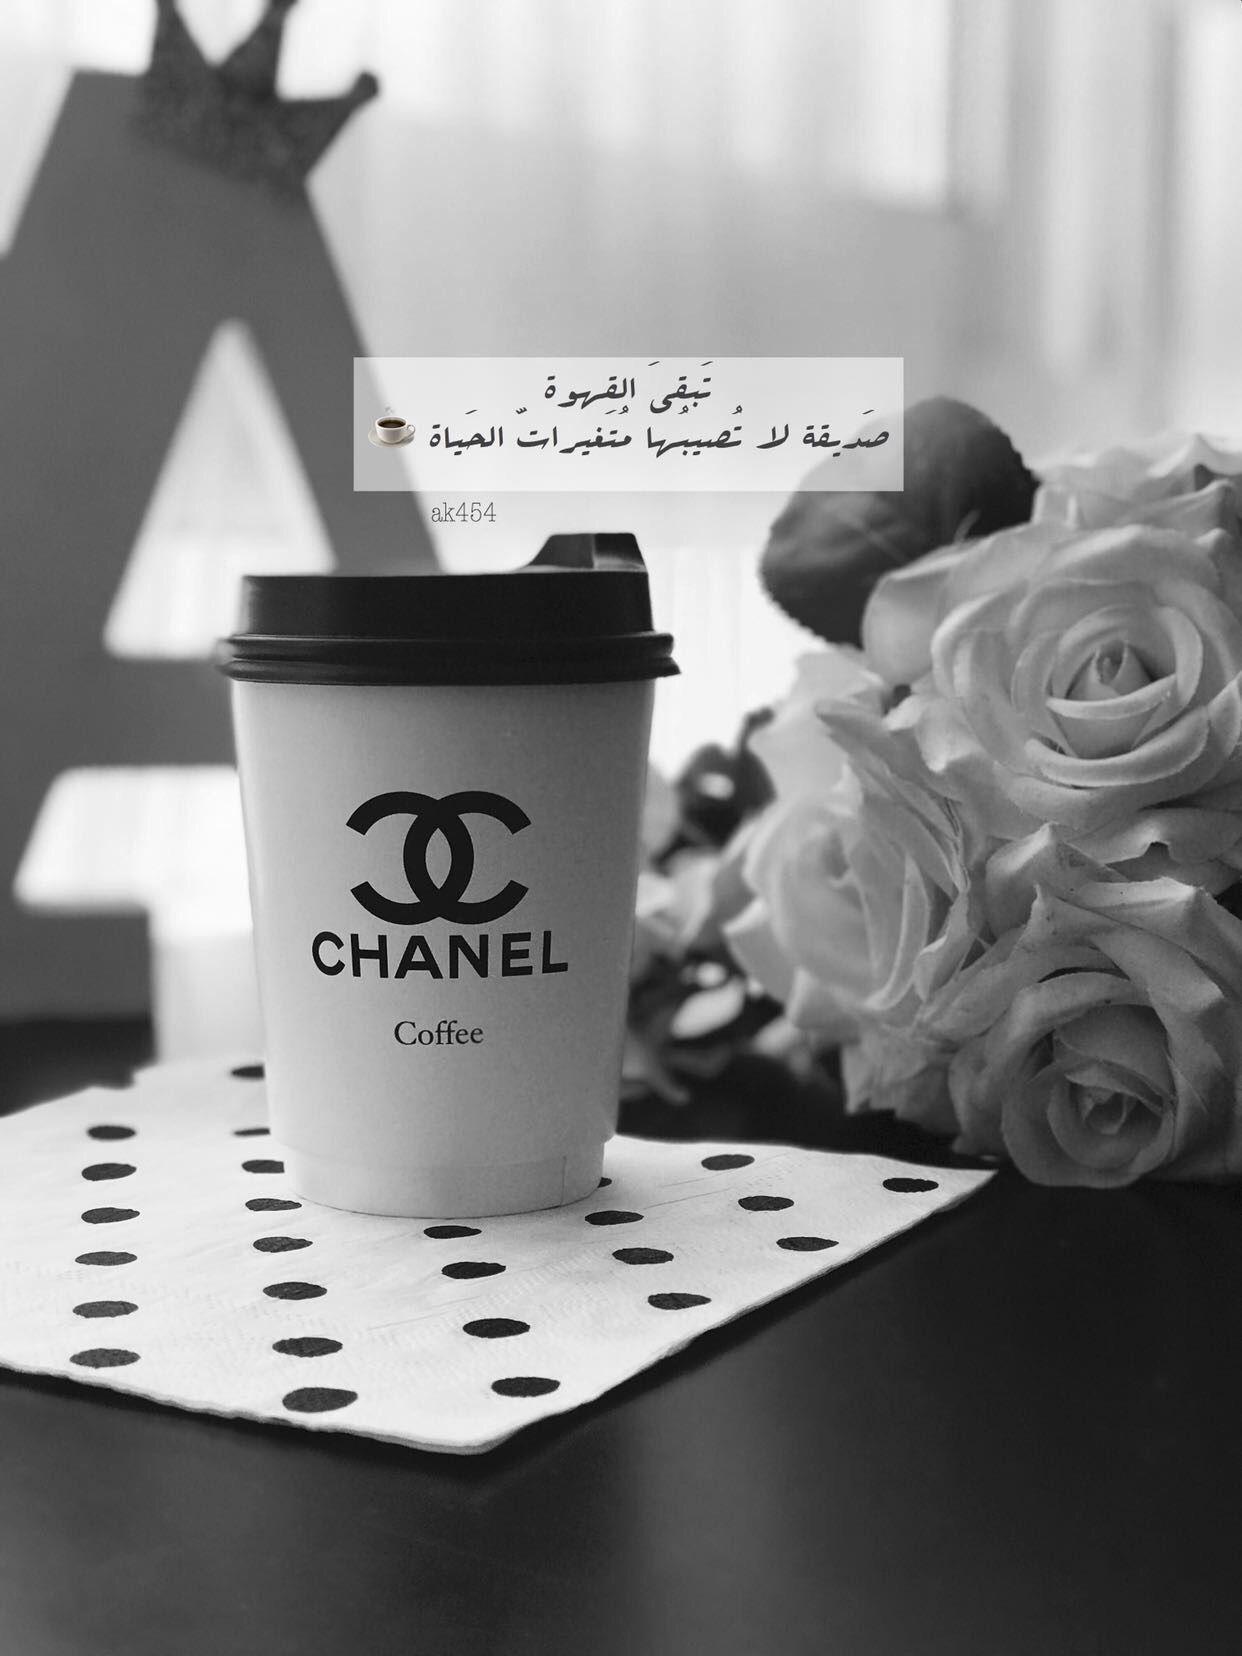 Goodmorning Cafe Coffee Design قهوة صباح الخير تصميم صور Coffee Quotes My Coffee Coffee